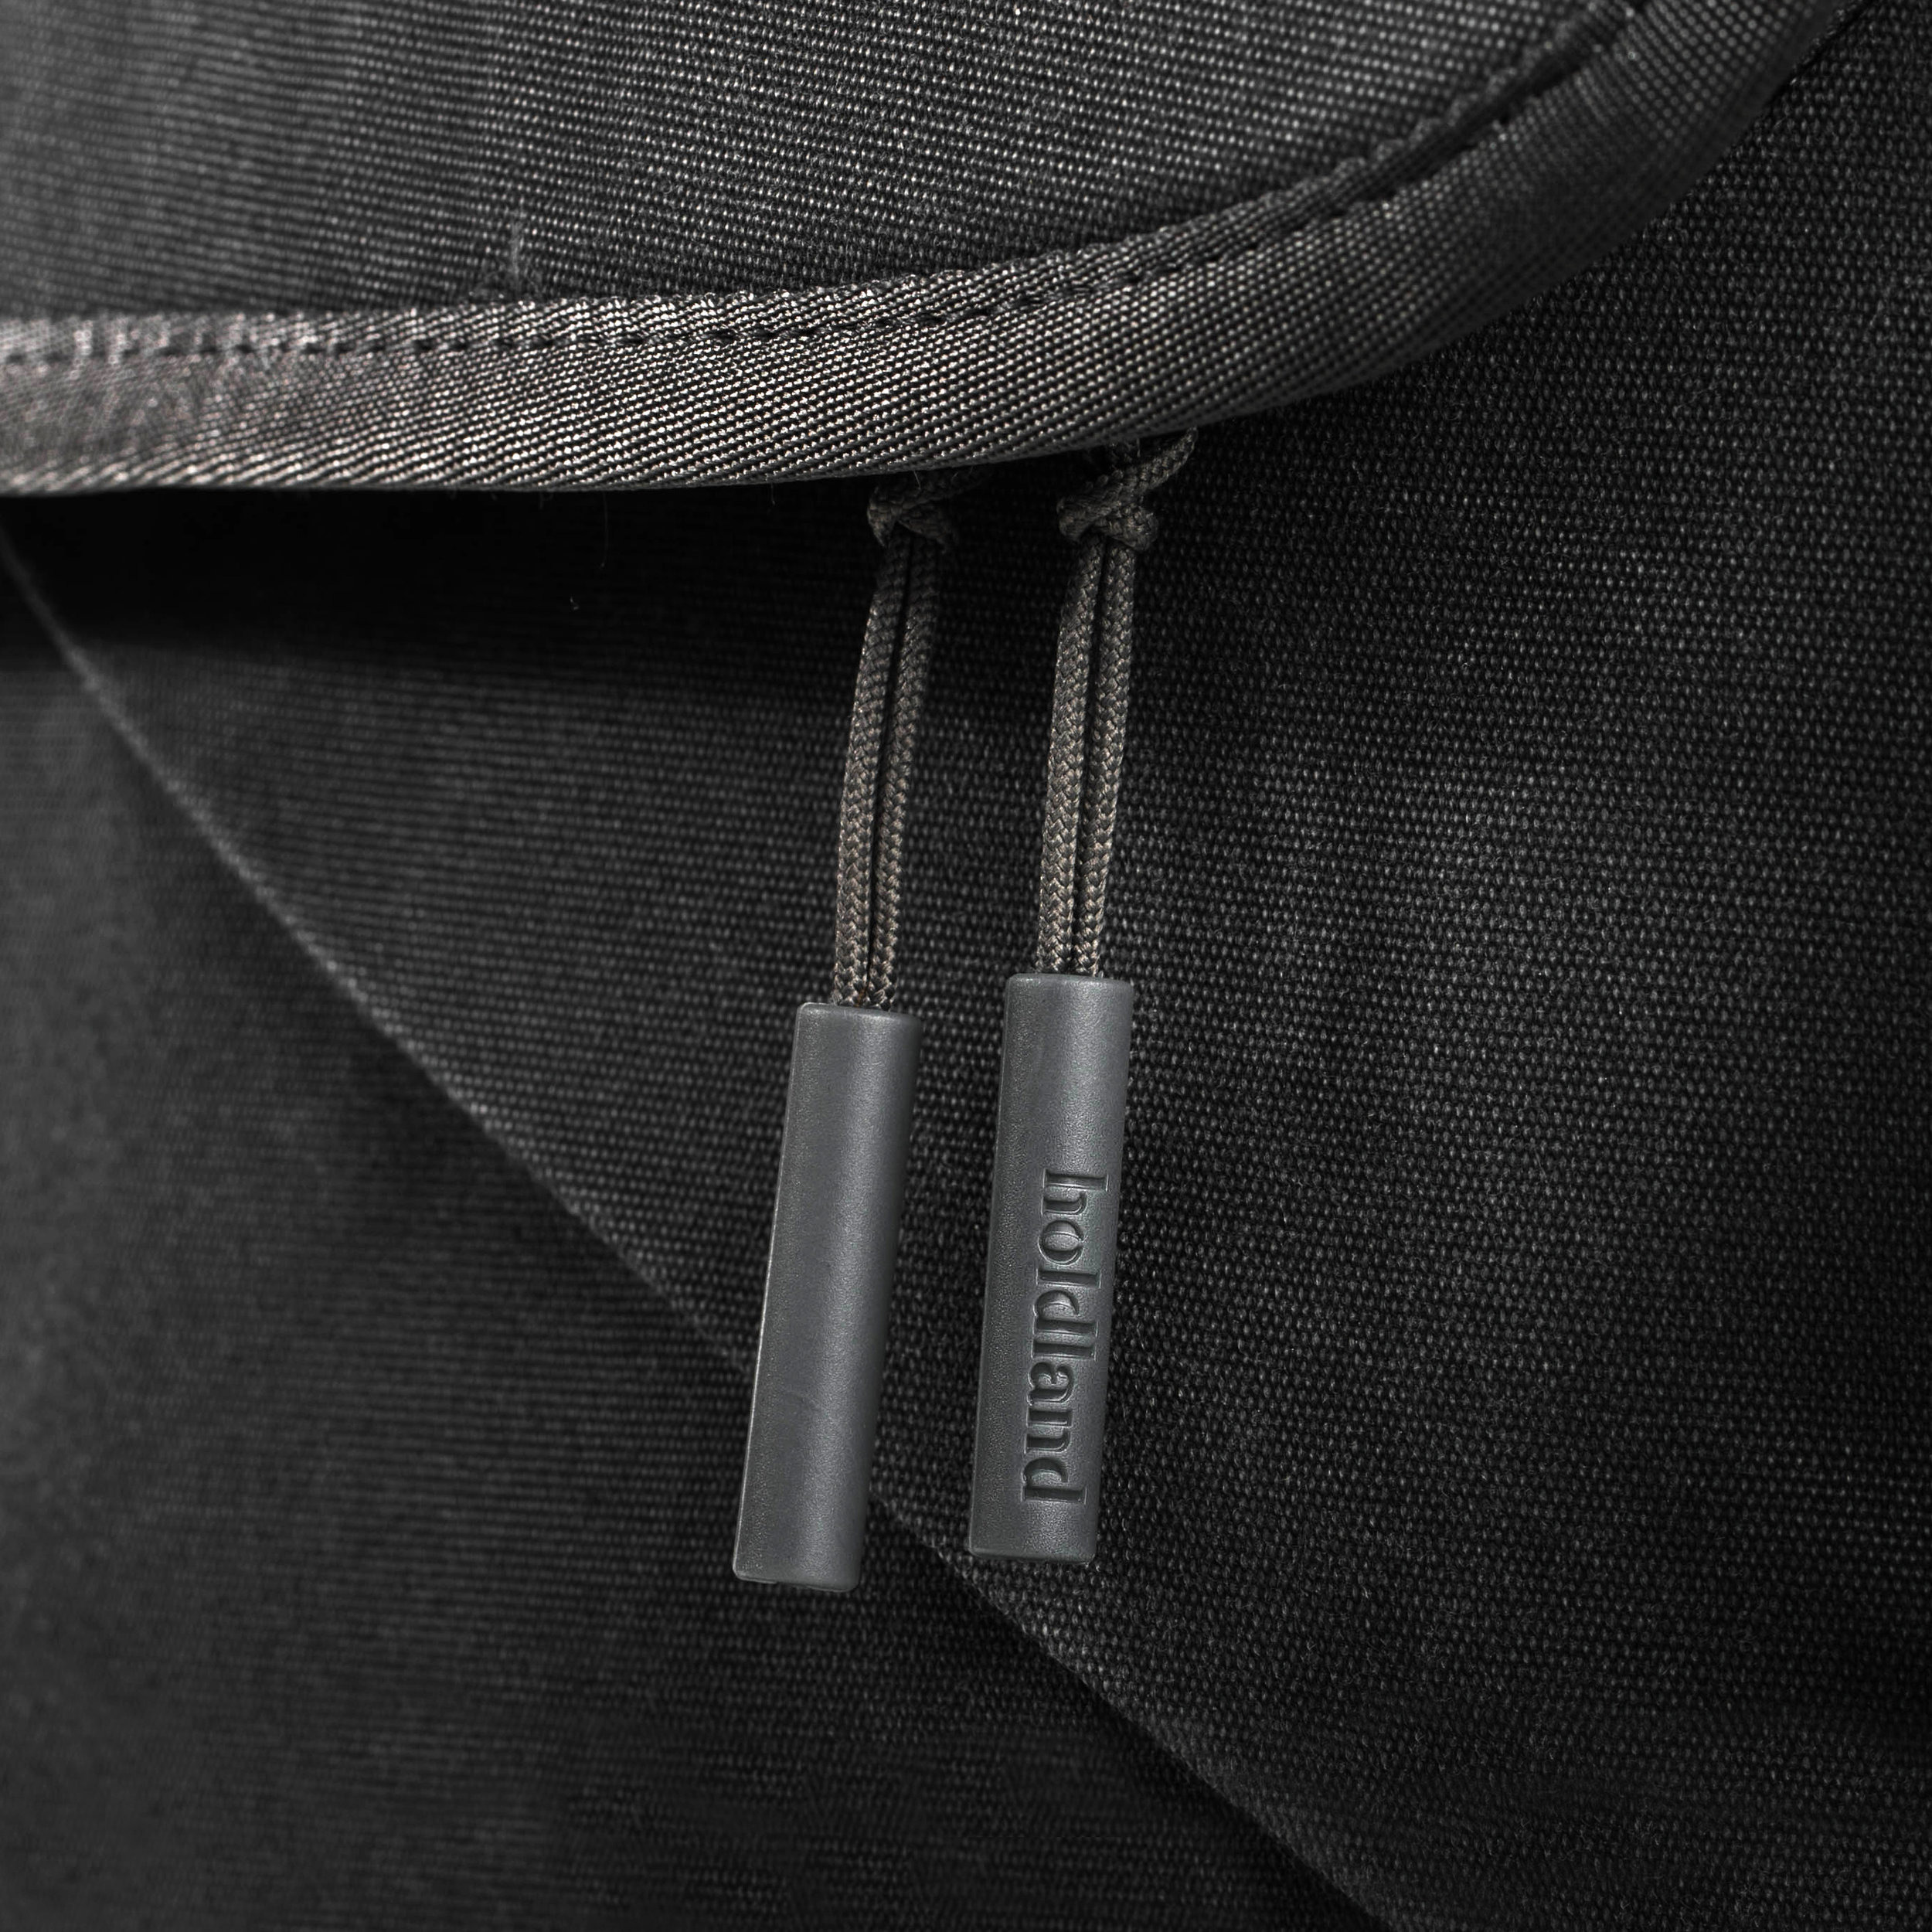 Holdland backpack zipper detail